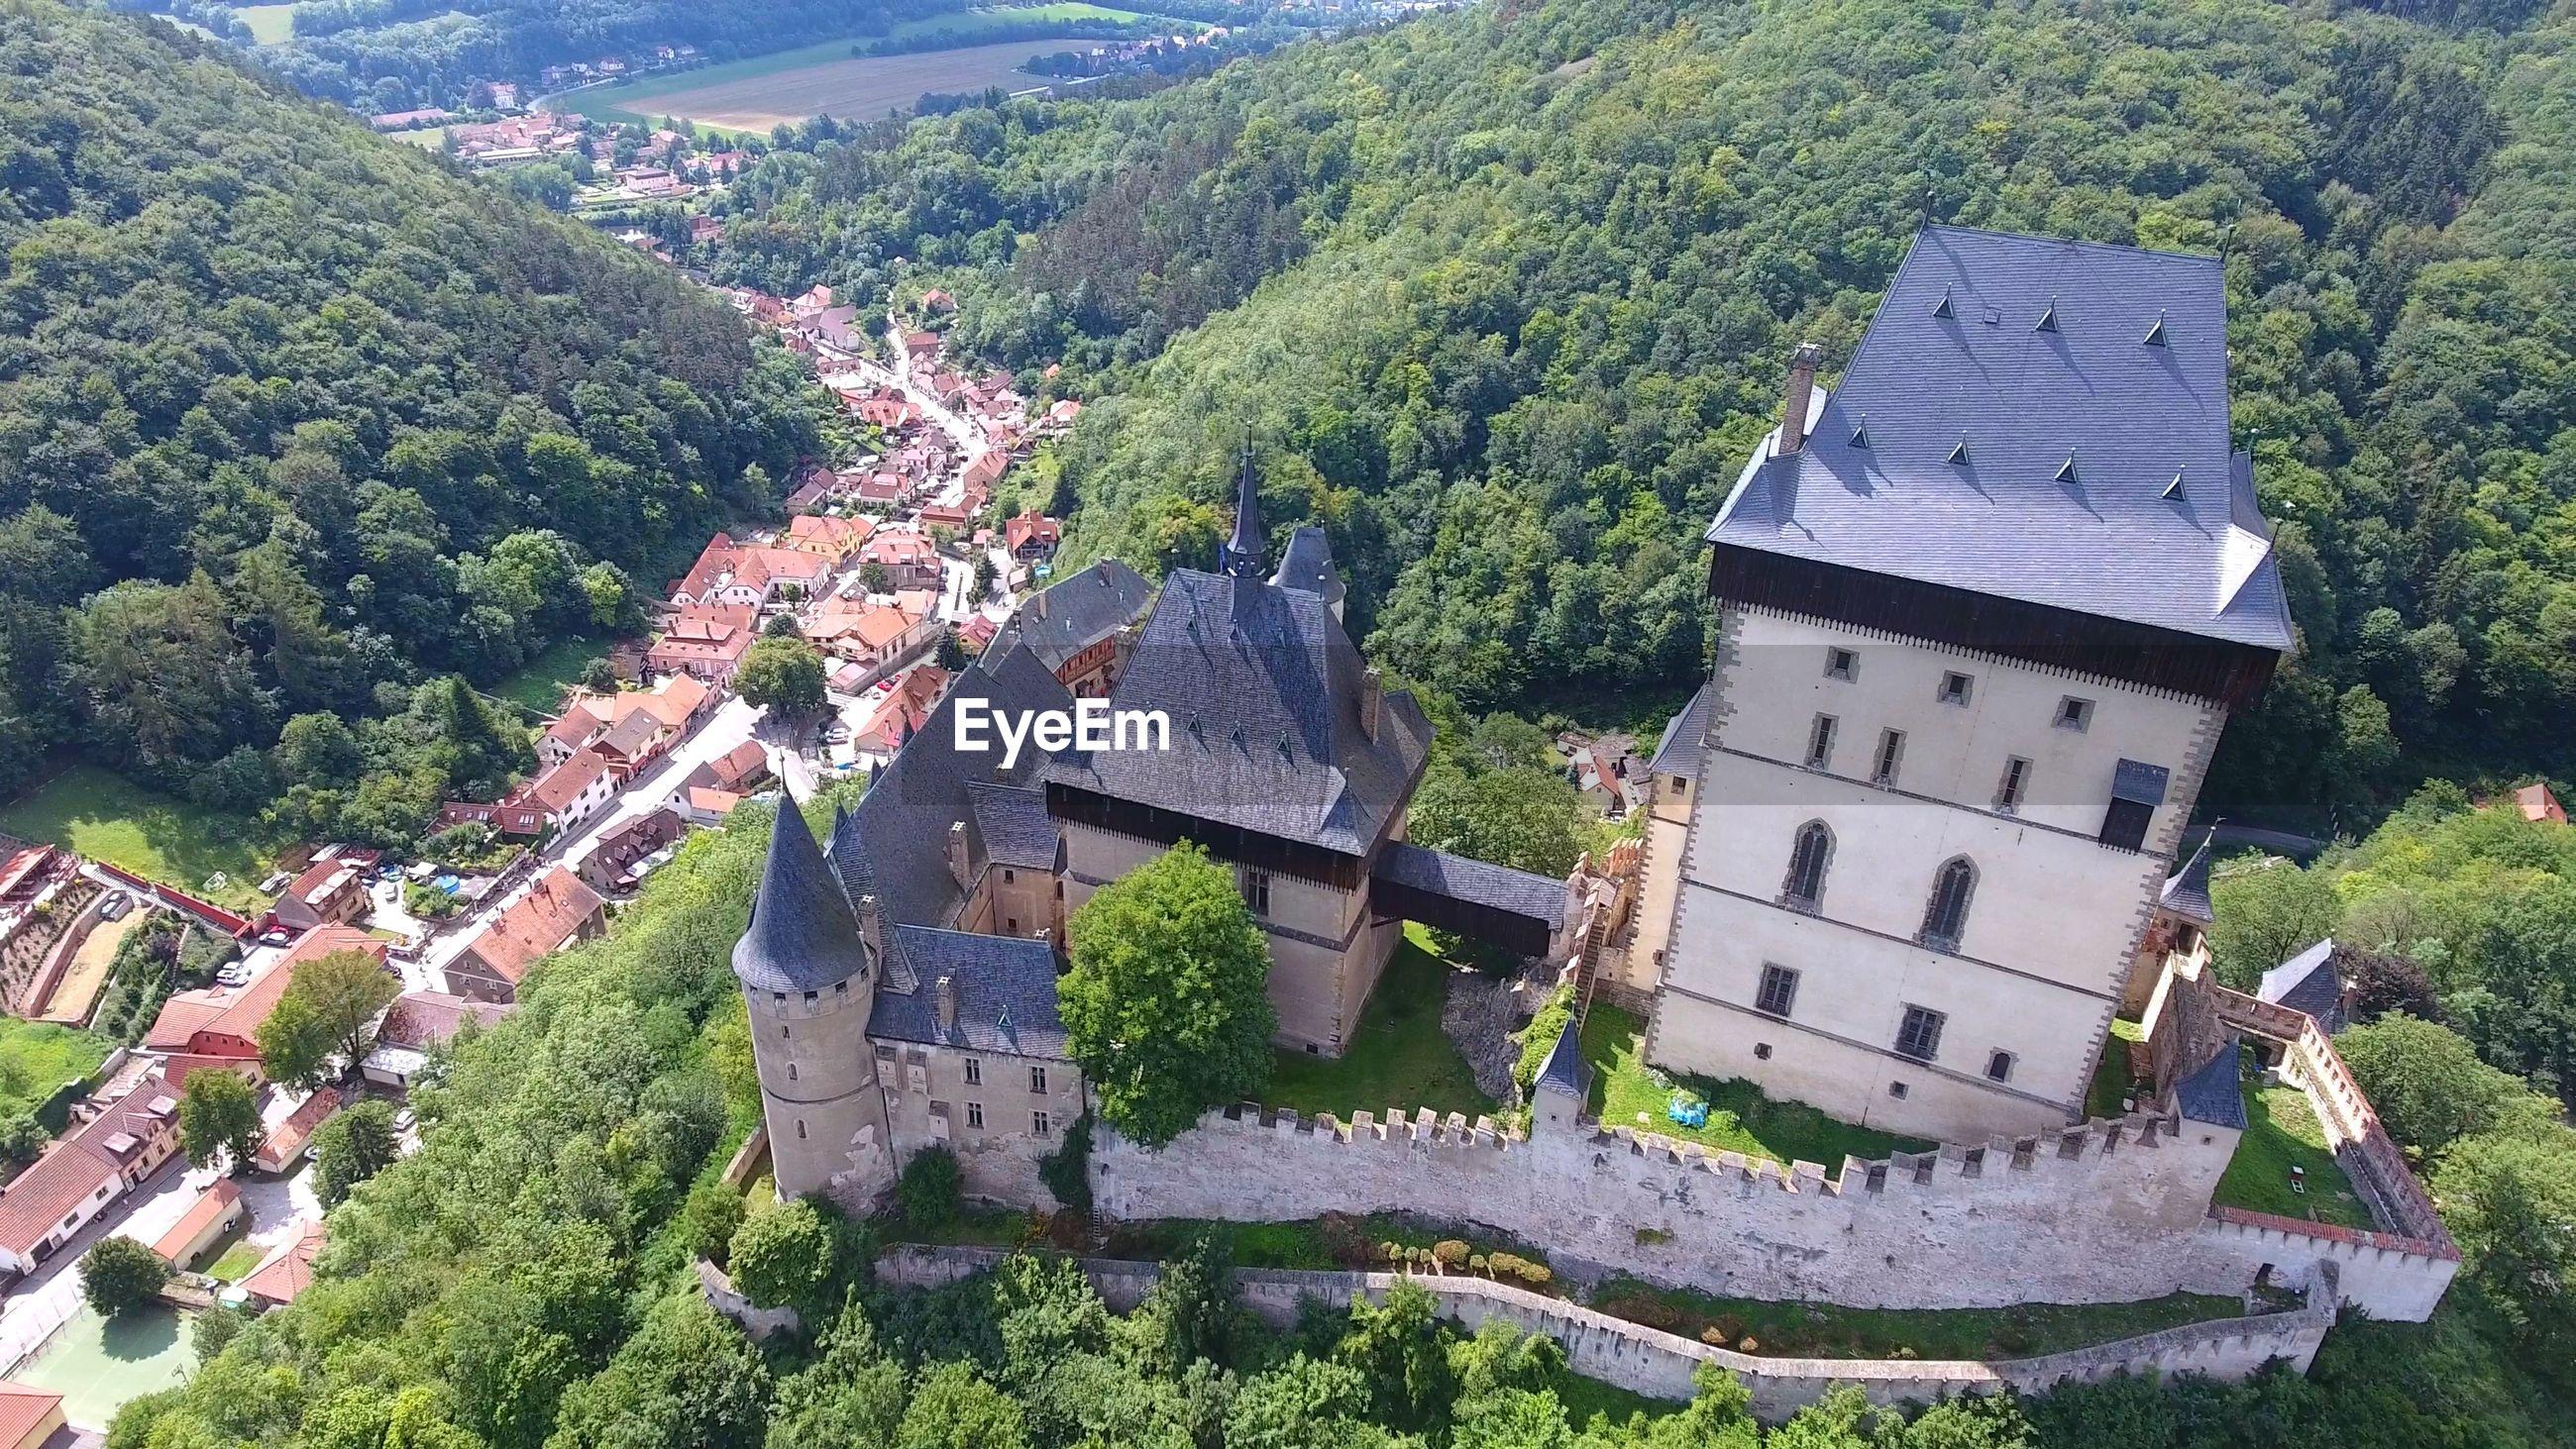 HIGH ANGLE VIEW OF HOUSES ON MOUNTAIN